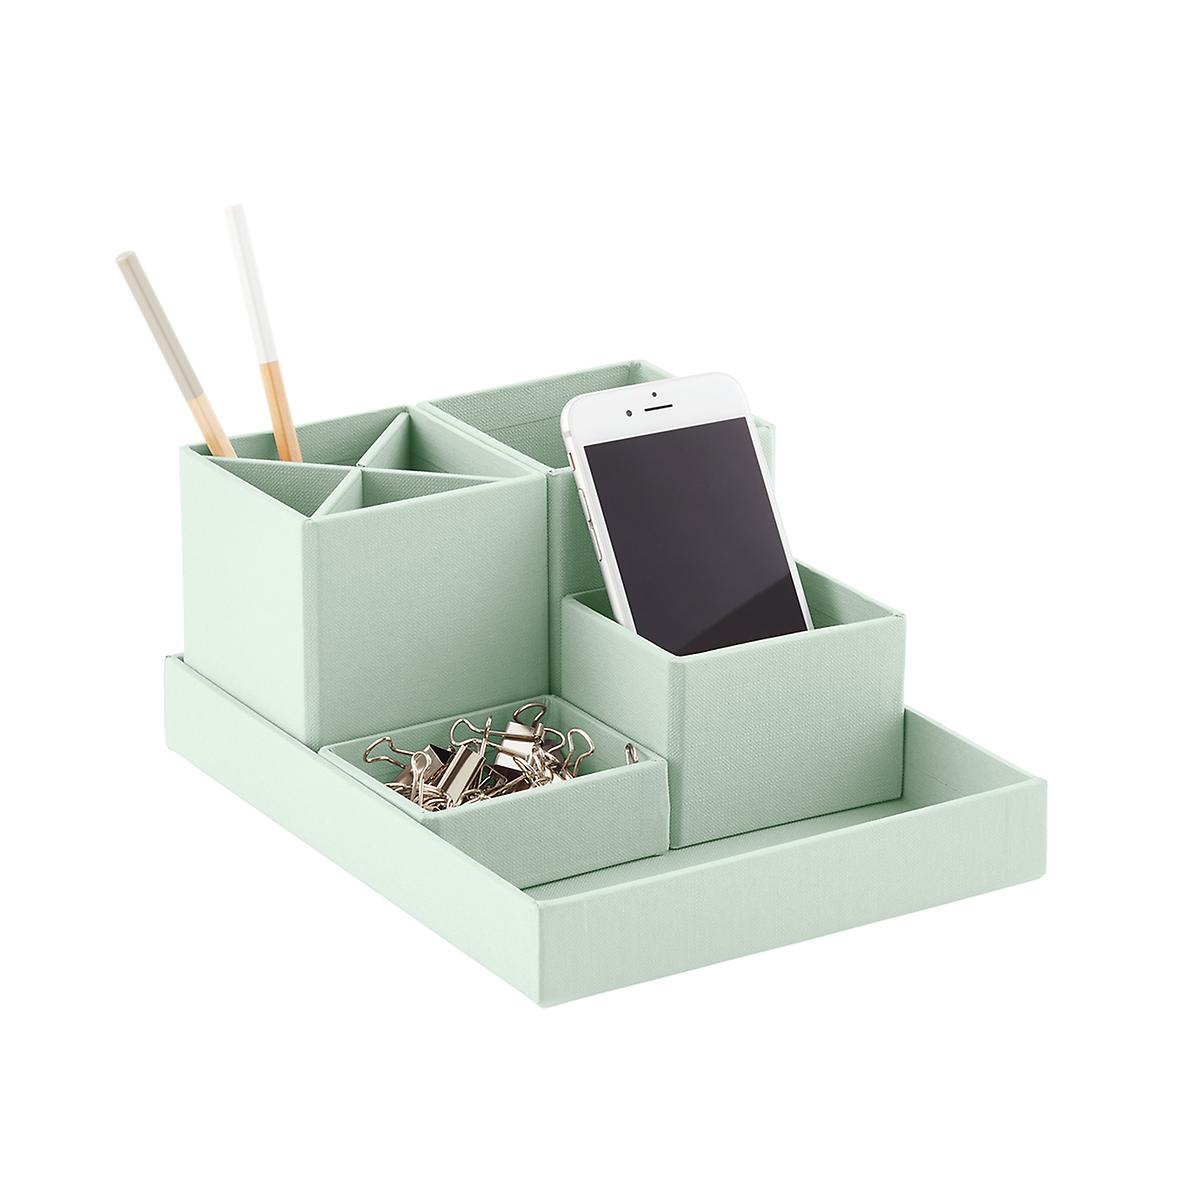 Favorite Bigso Mint Stockholm Desktop Organizer | The Container Store OZ22